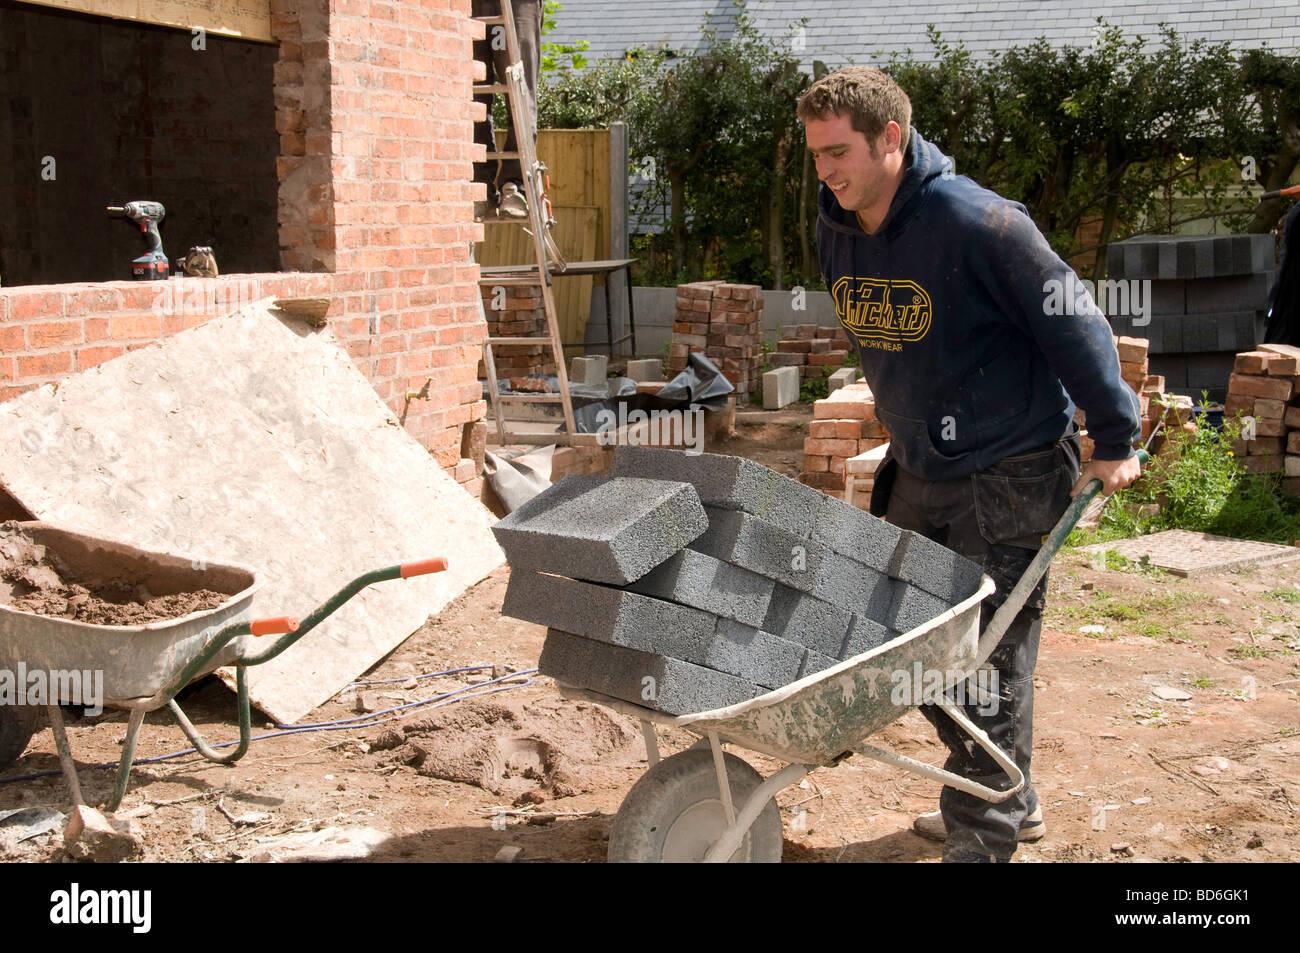 Man with wheelbarrow loaded with bricks - Stock Image